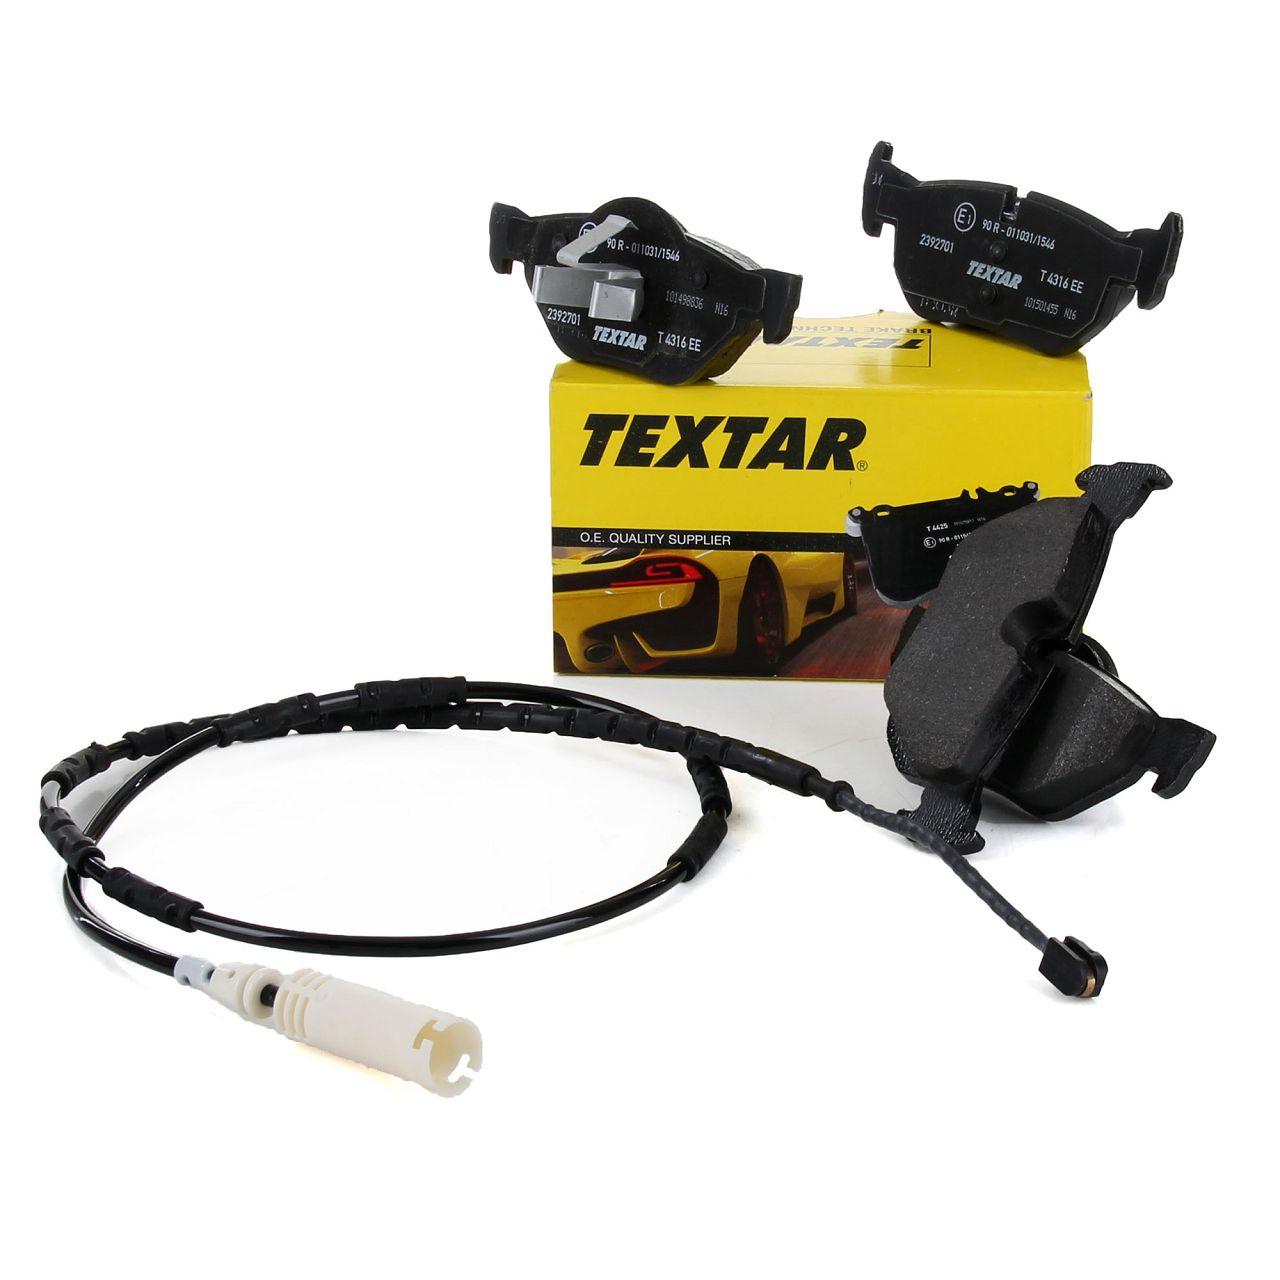 TEXTAR Bremsbeläge + Wako für BMW 1er E81 E87 E88 E82 3er E90 E91 E92 E93 hinten